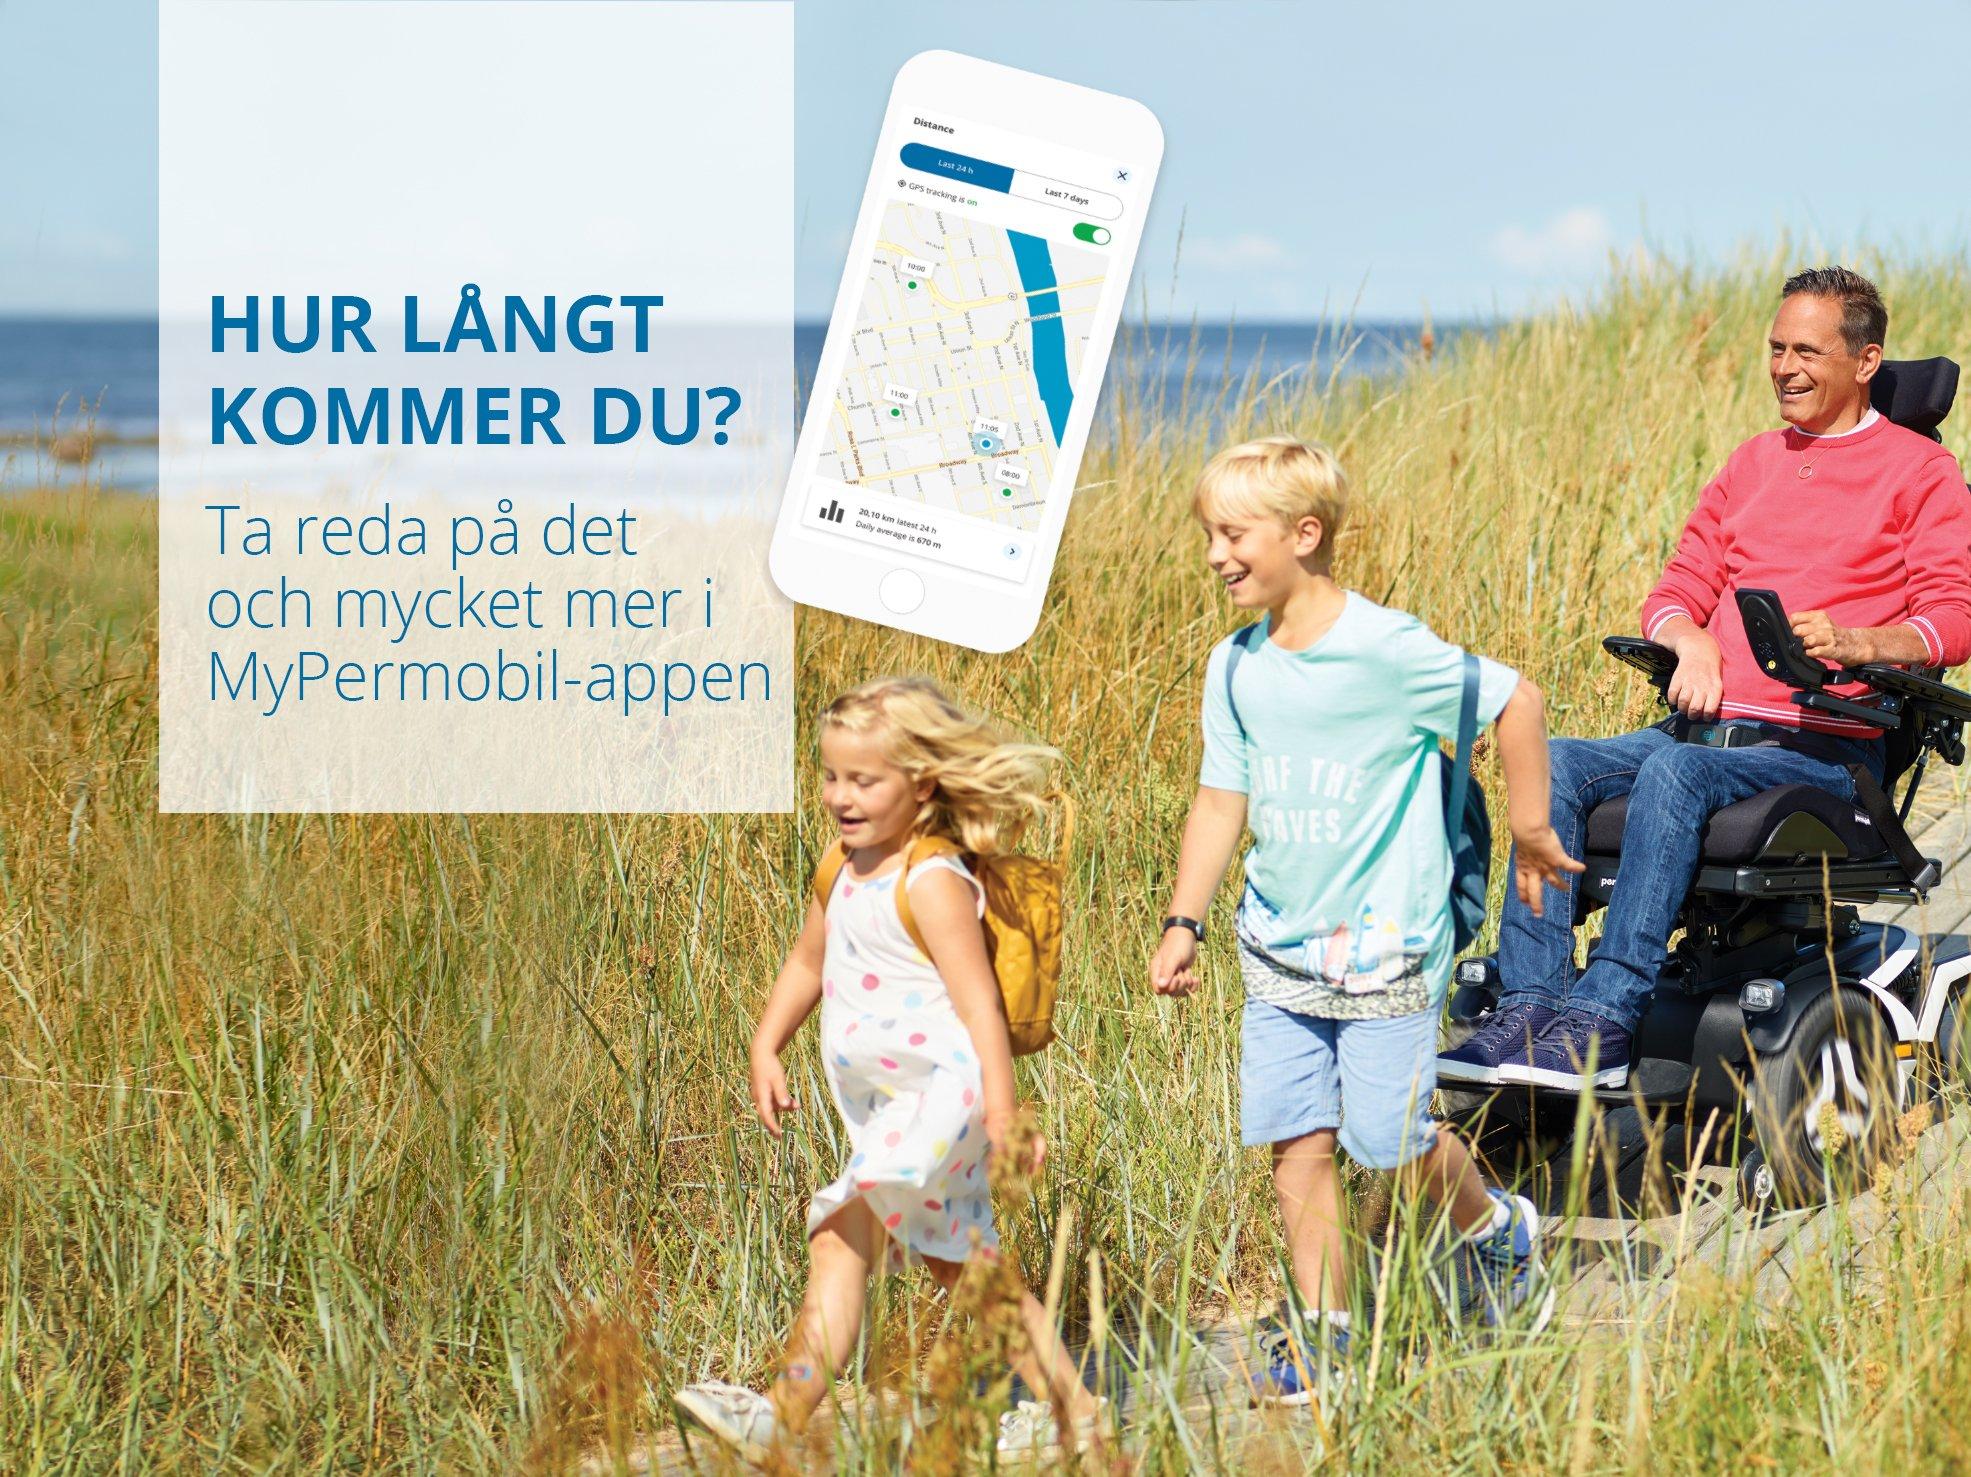 Landing-page-image_Summer_SE